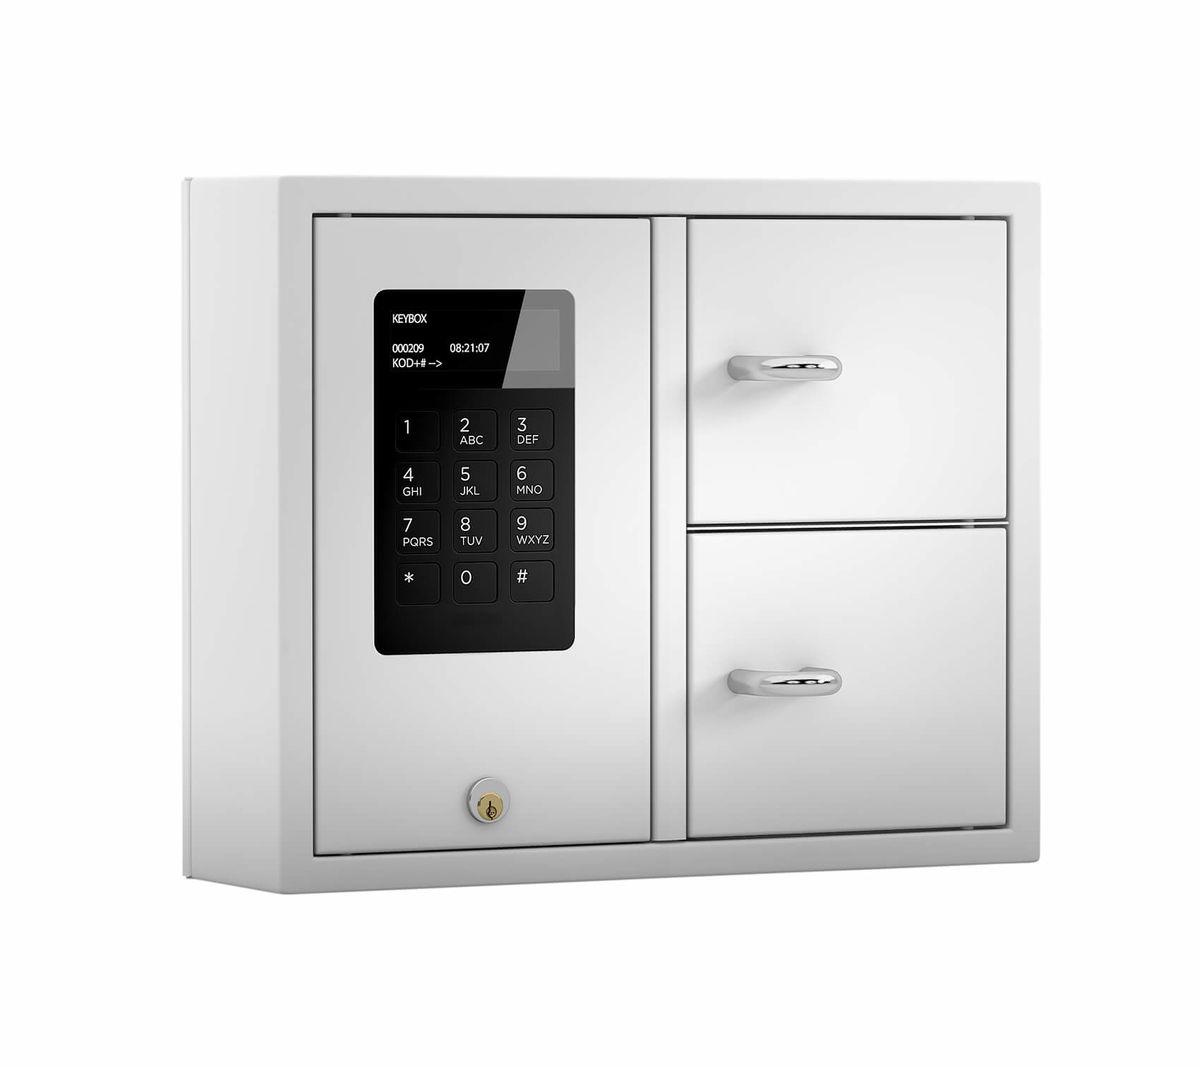 Planetstar KeyIntellico-Premium 2 Schlüsselausgabesystem